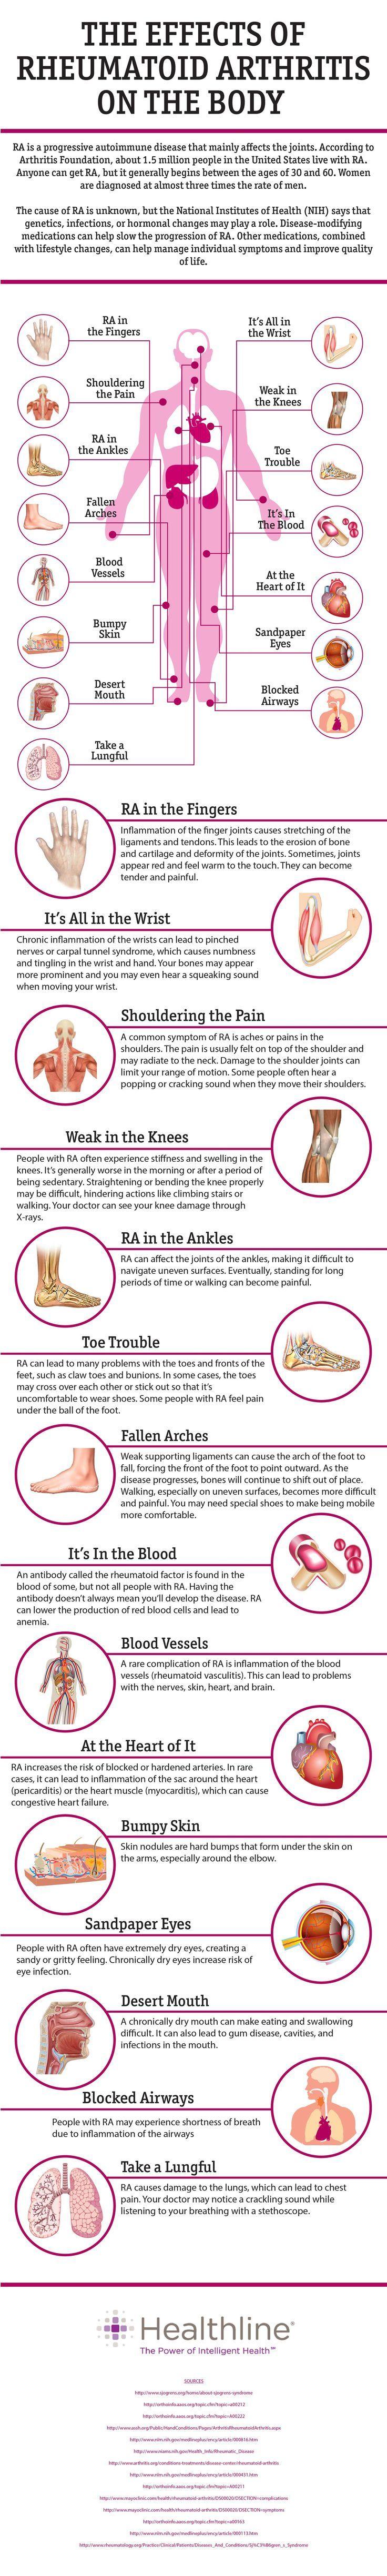 The Effects of Rheumatoid Arthritis on the Body.